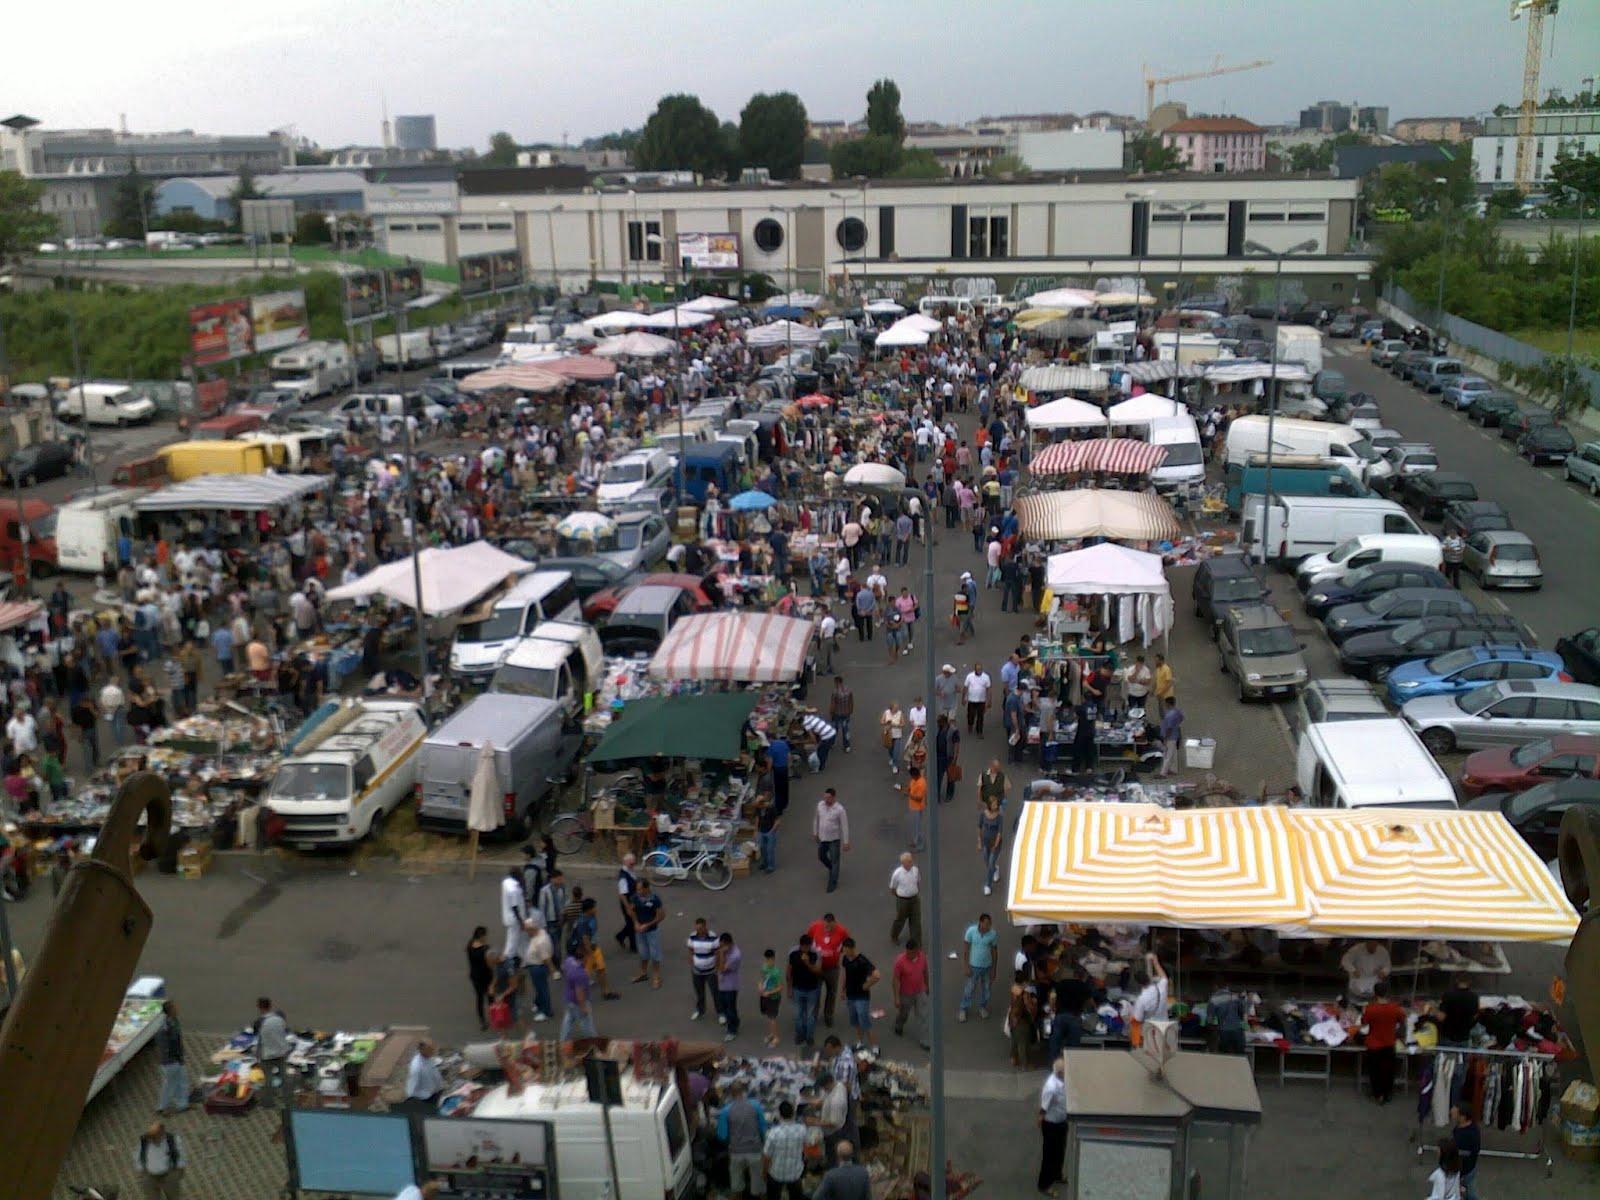 mercatino piazzale segni sassari basketball - photo#45